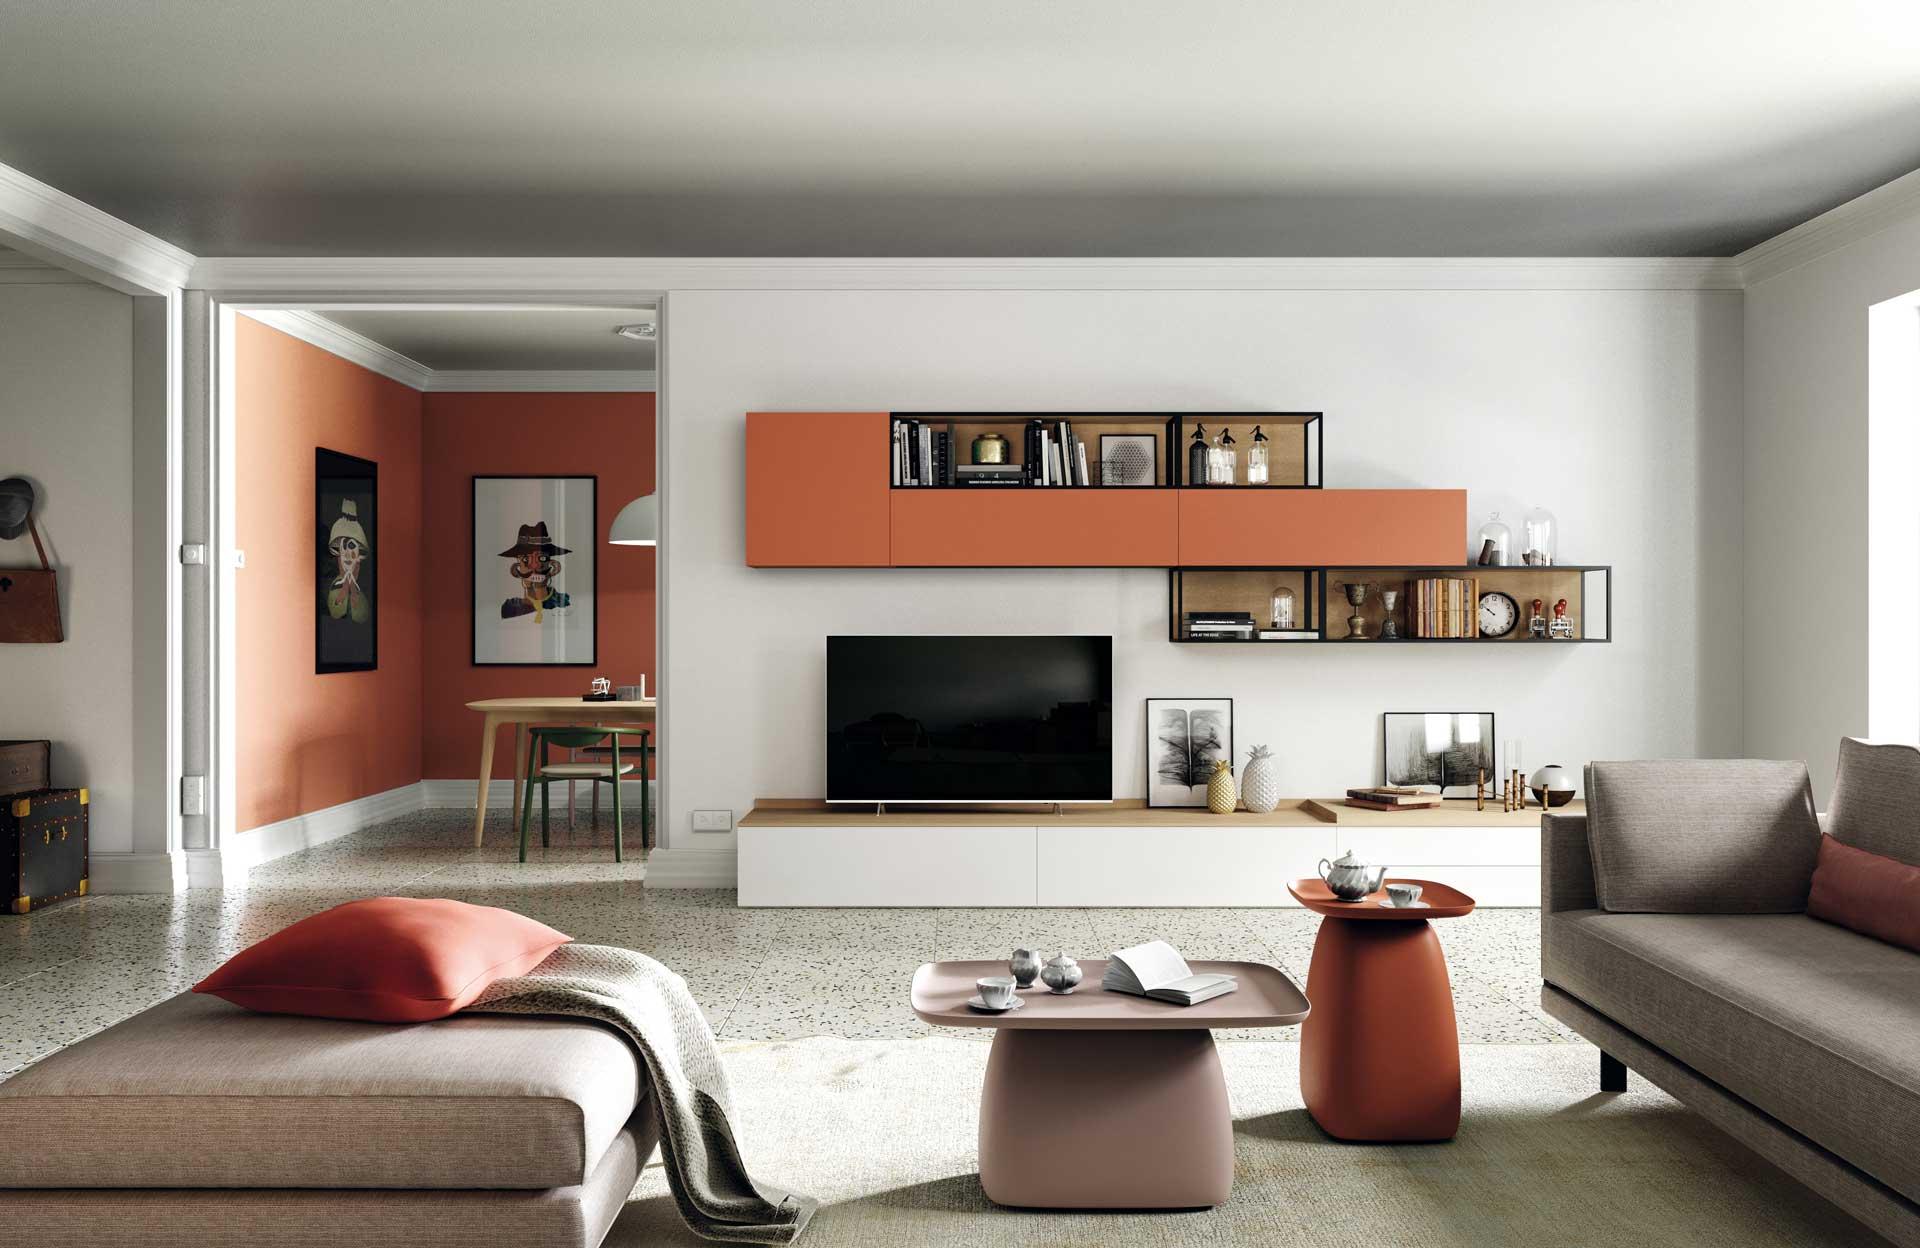 Studi Di Architettura Cuneo studio mac - architettura e grafica 3d